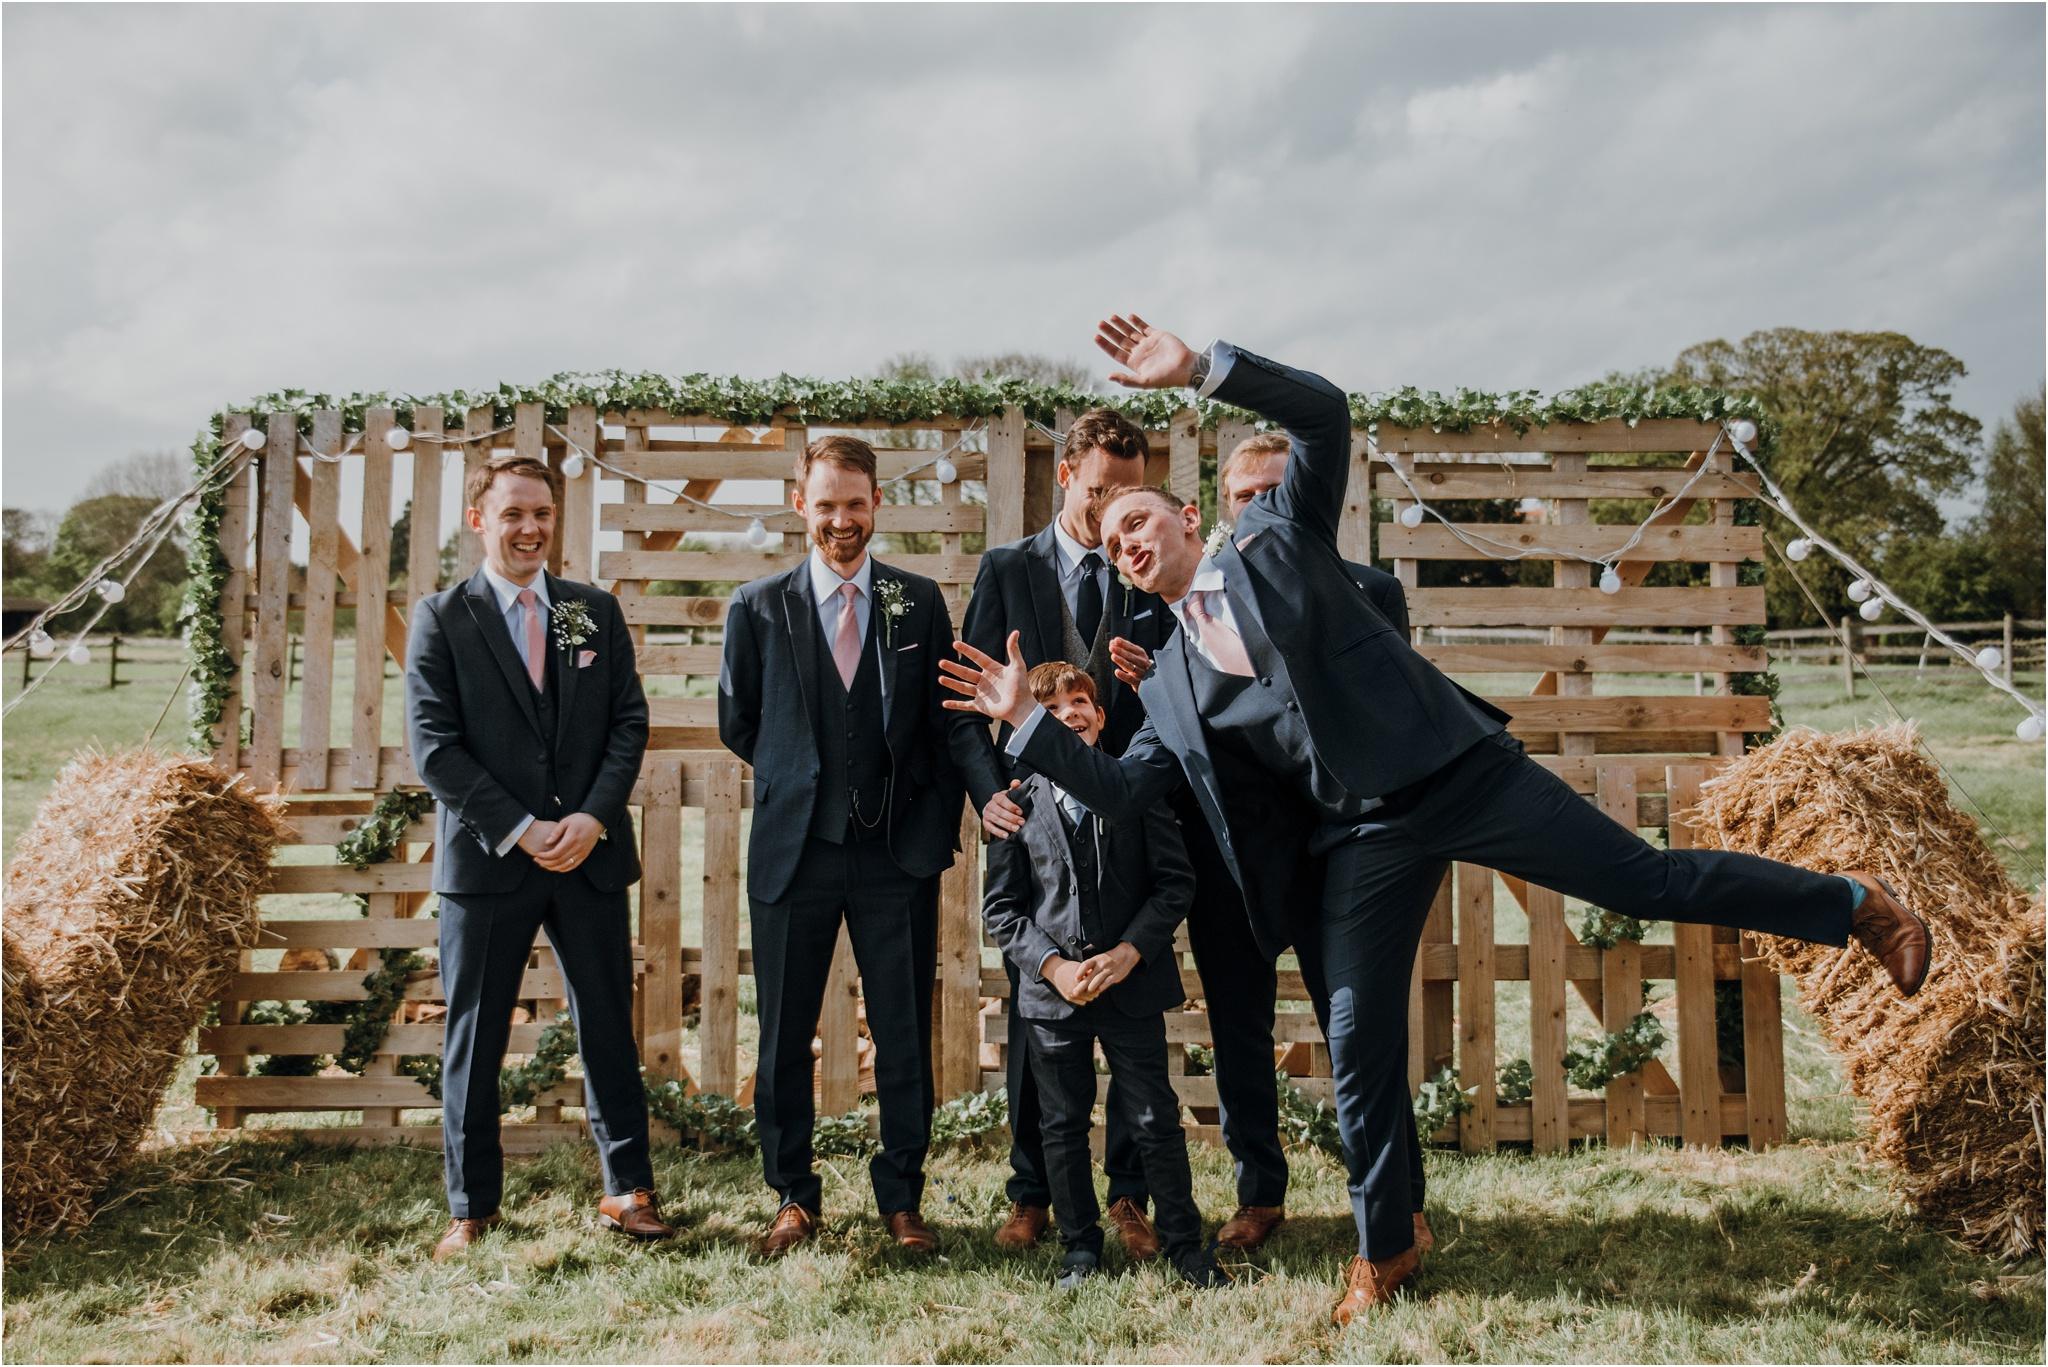 Outdoor-country-wedding-Edinburgh-photographer__0103.jpg